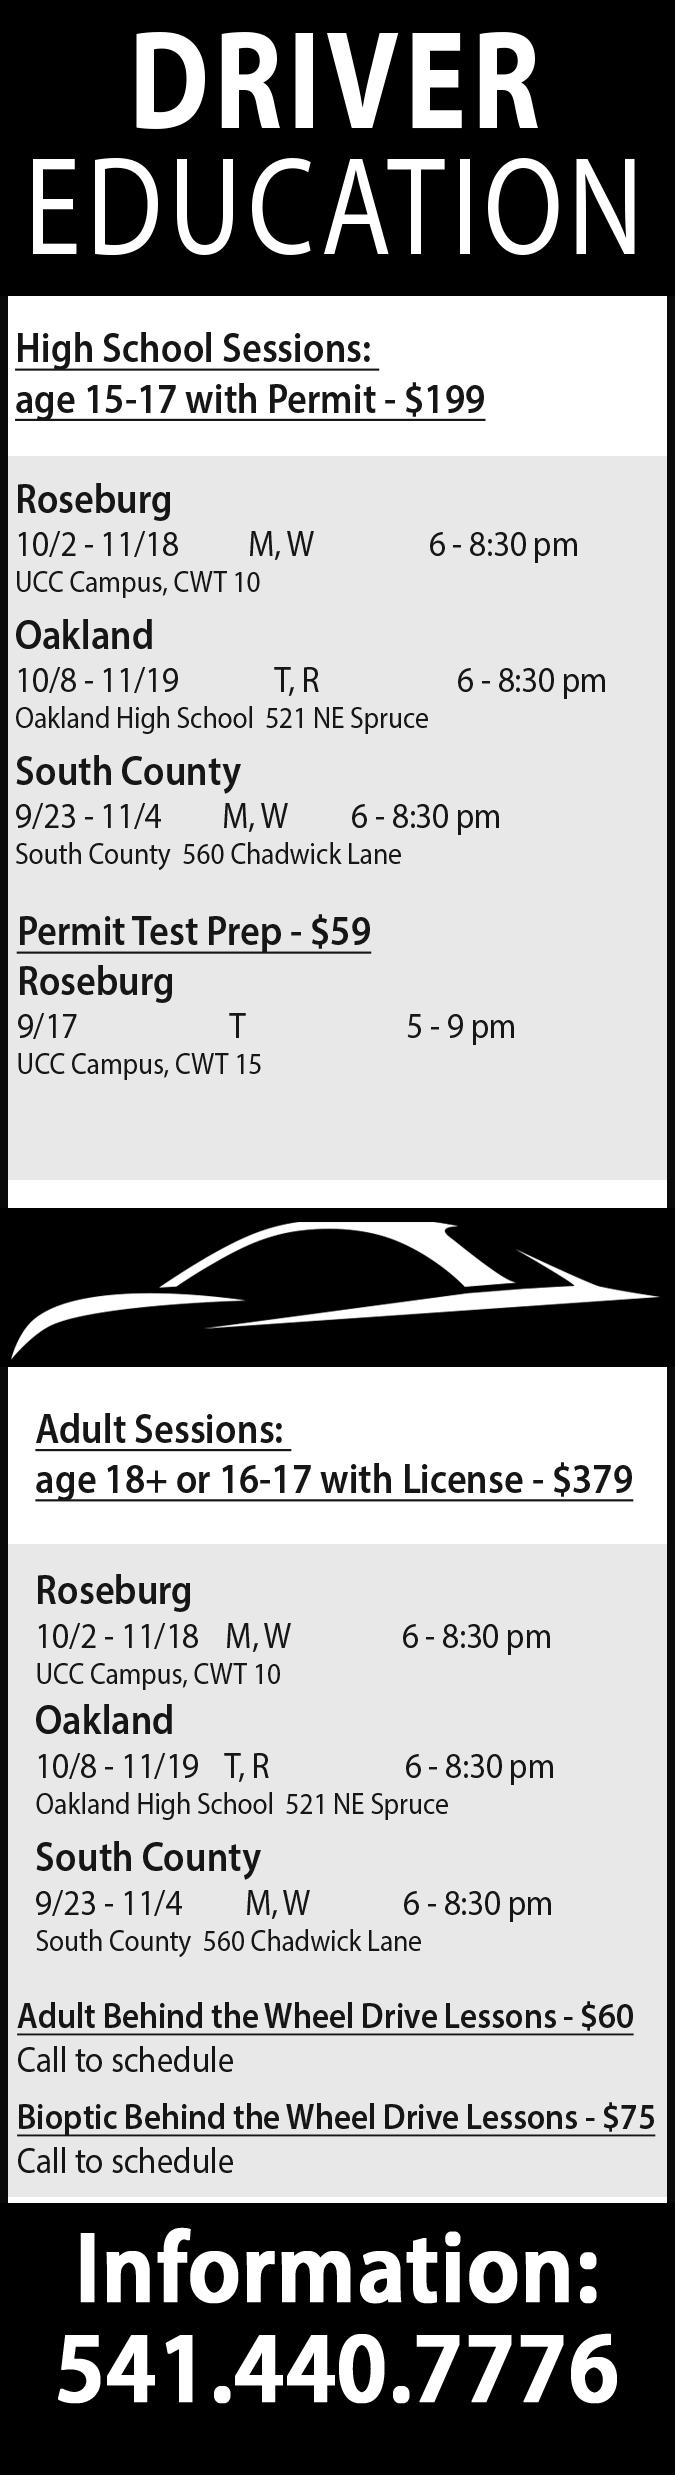 Drivers Education - Umpqua Community College